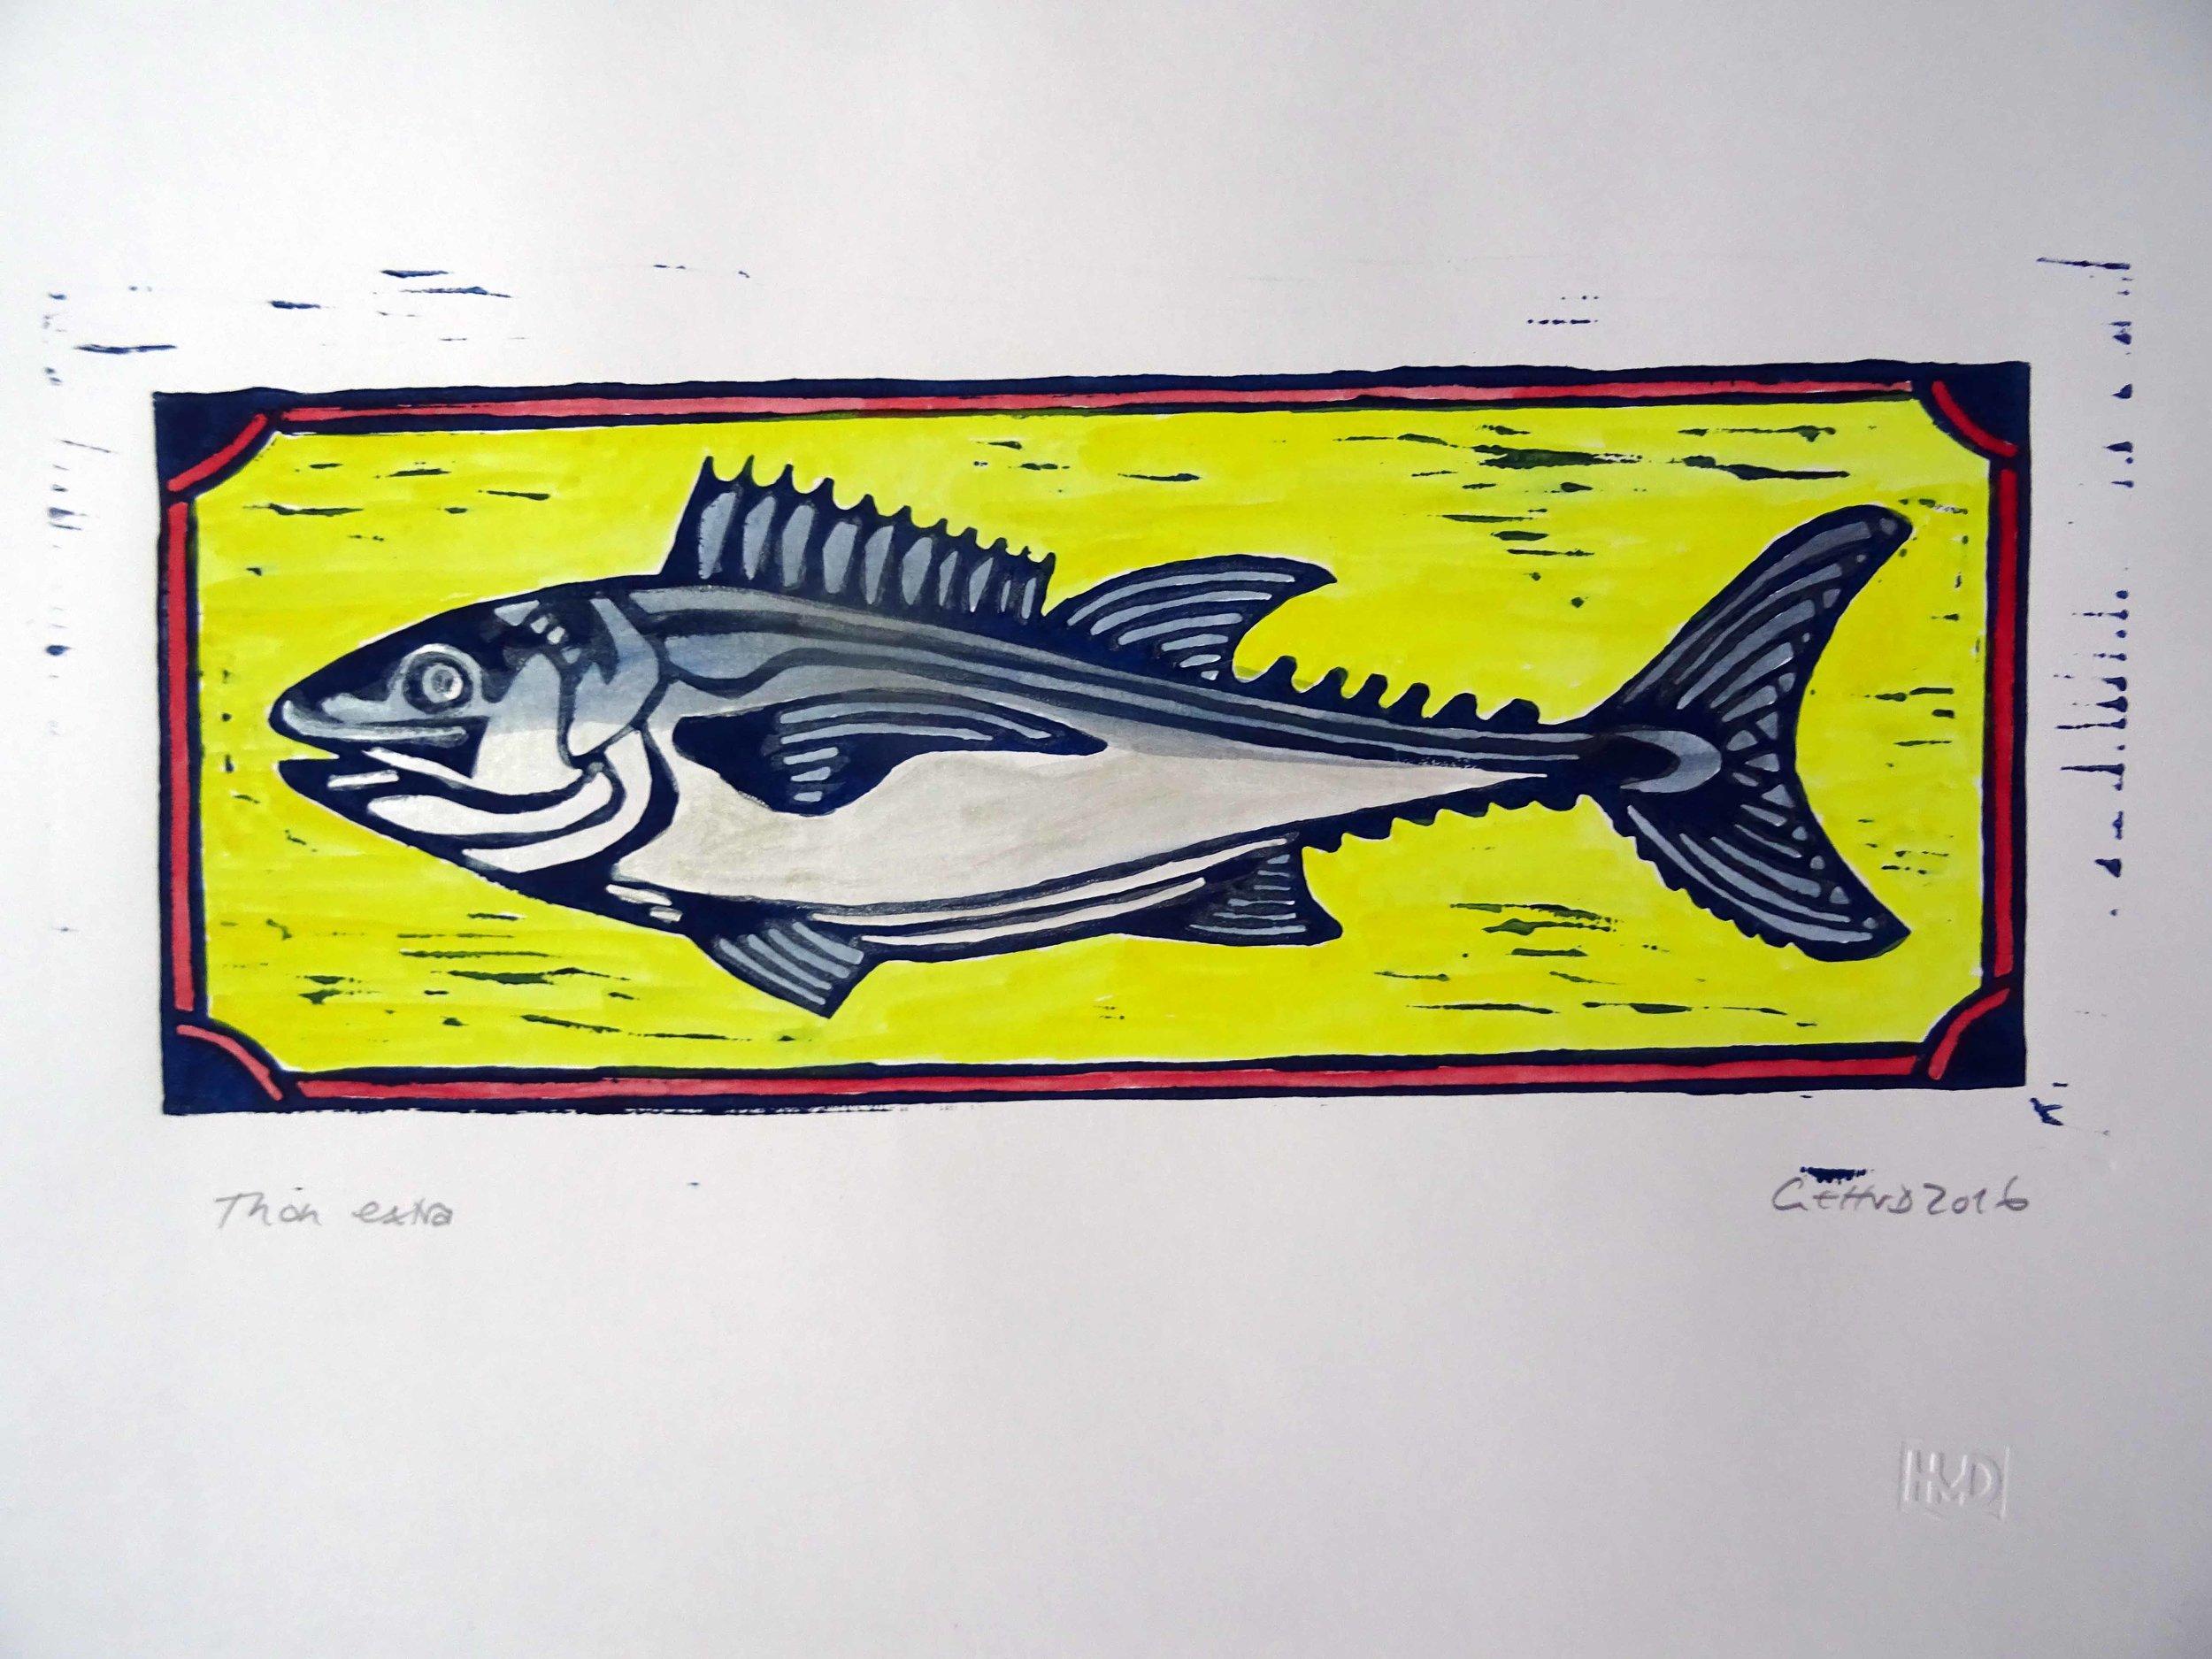 51 - thonextra, coloured lino 14x33 cm, 30 €